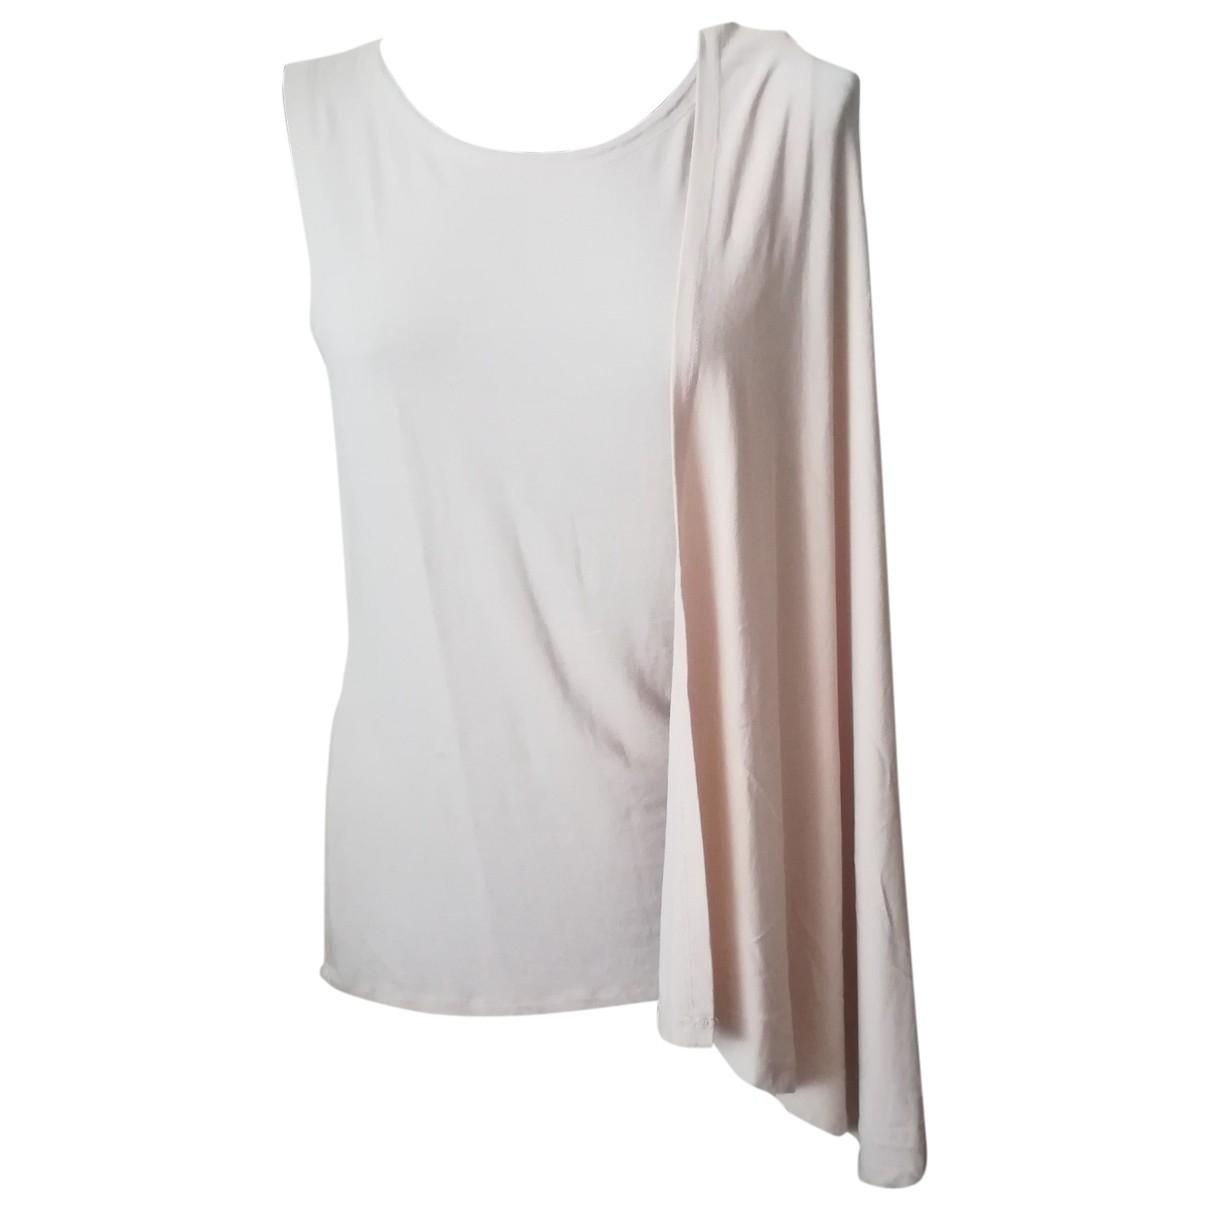 Mm6 \N Pink  top for Women L International